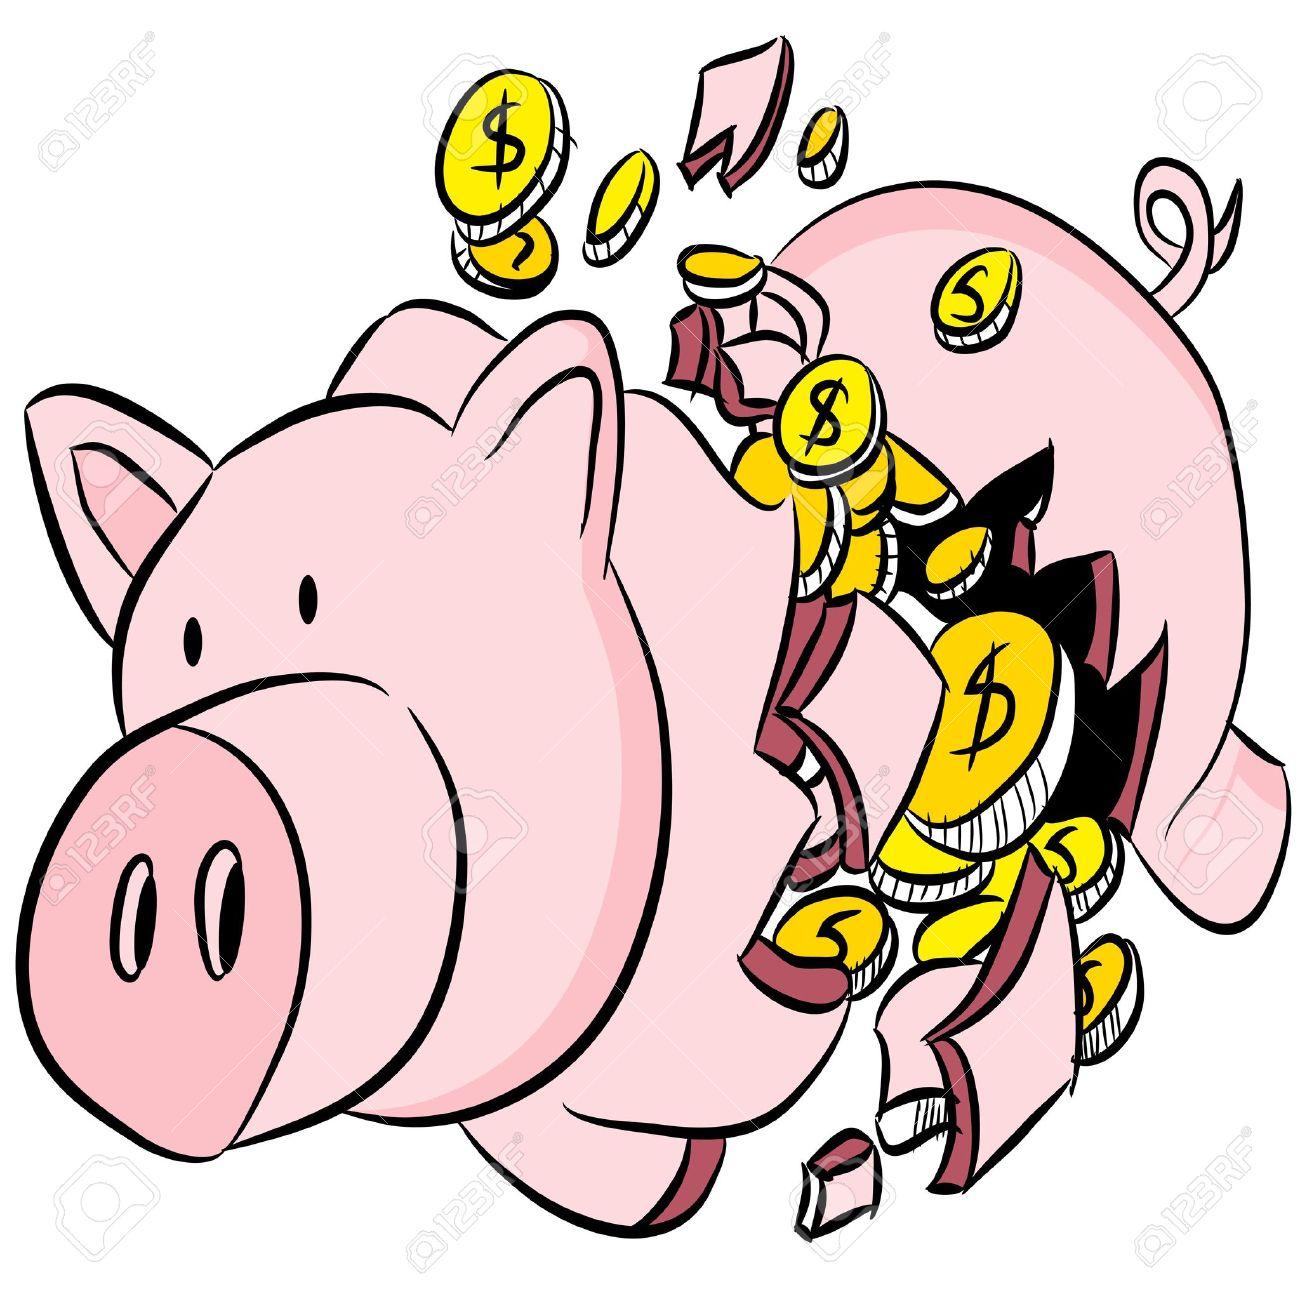 Car shaped piggy bank clipart vector library Broken piggy bank clipart - ClipartFox vector library